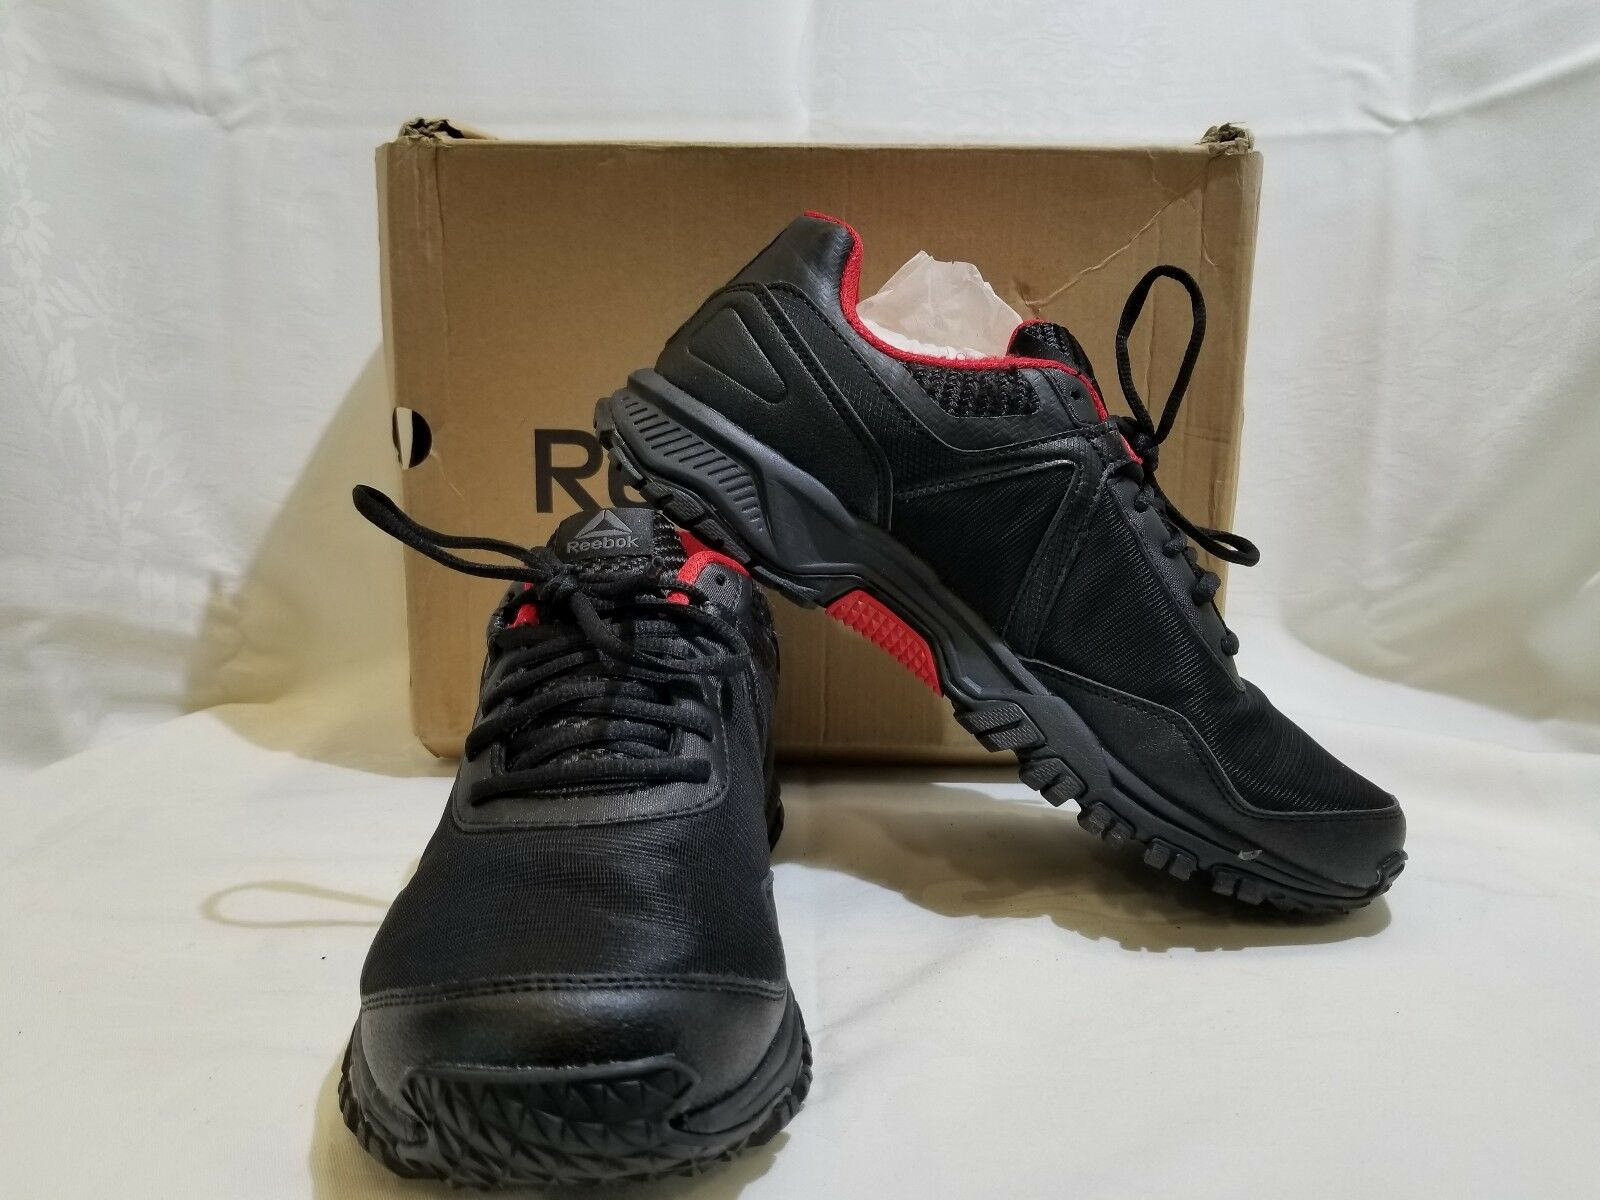 Reebok Trail Running Zapatos para Hombre US 10 3.0